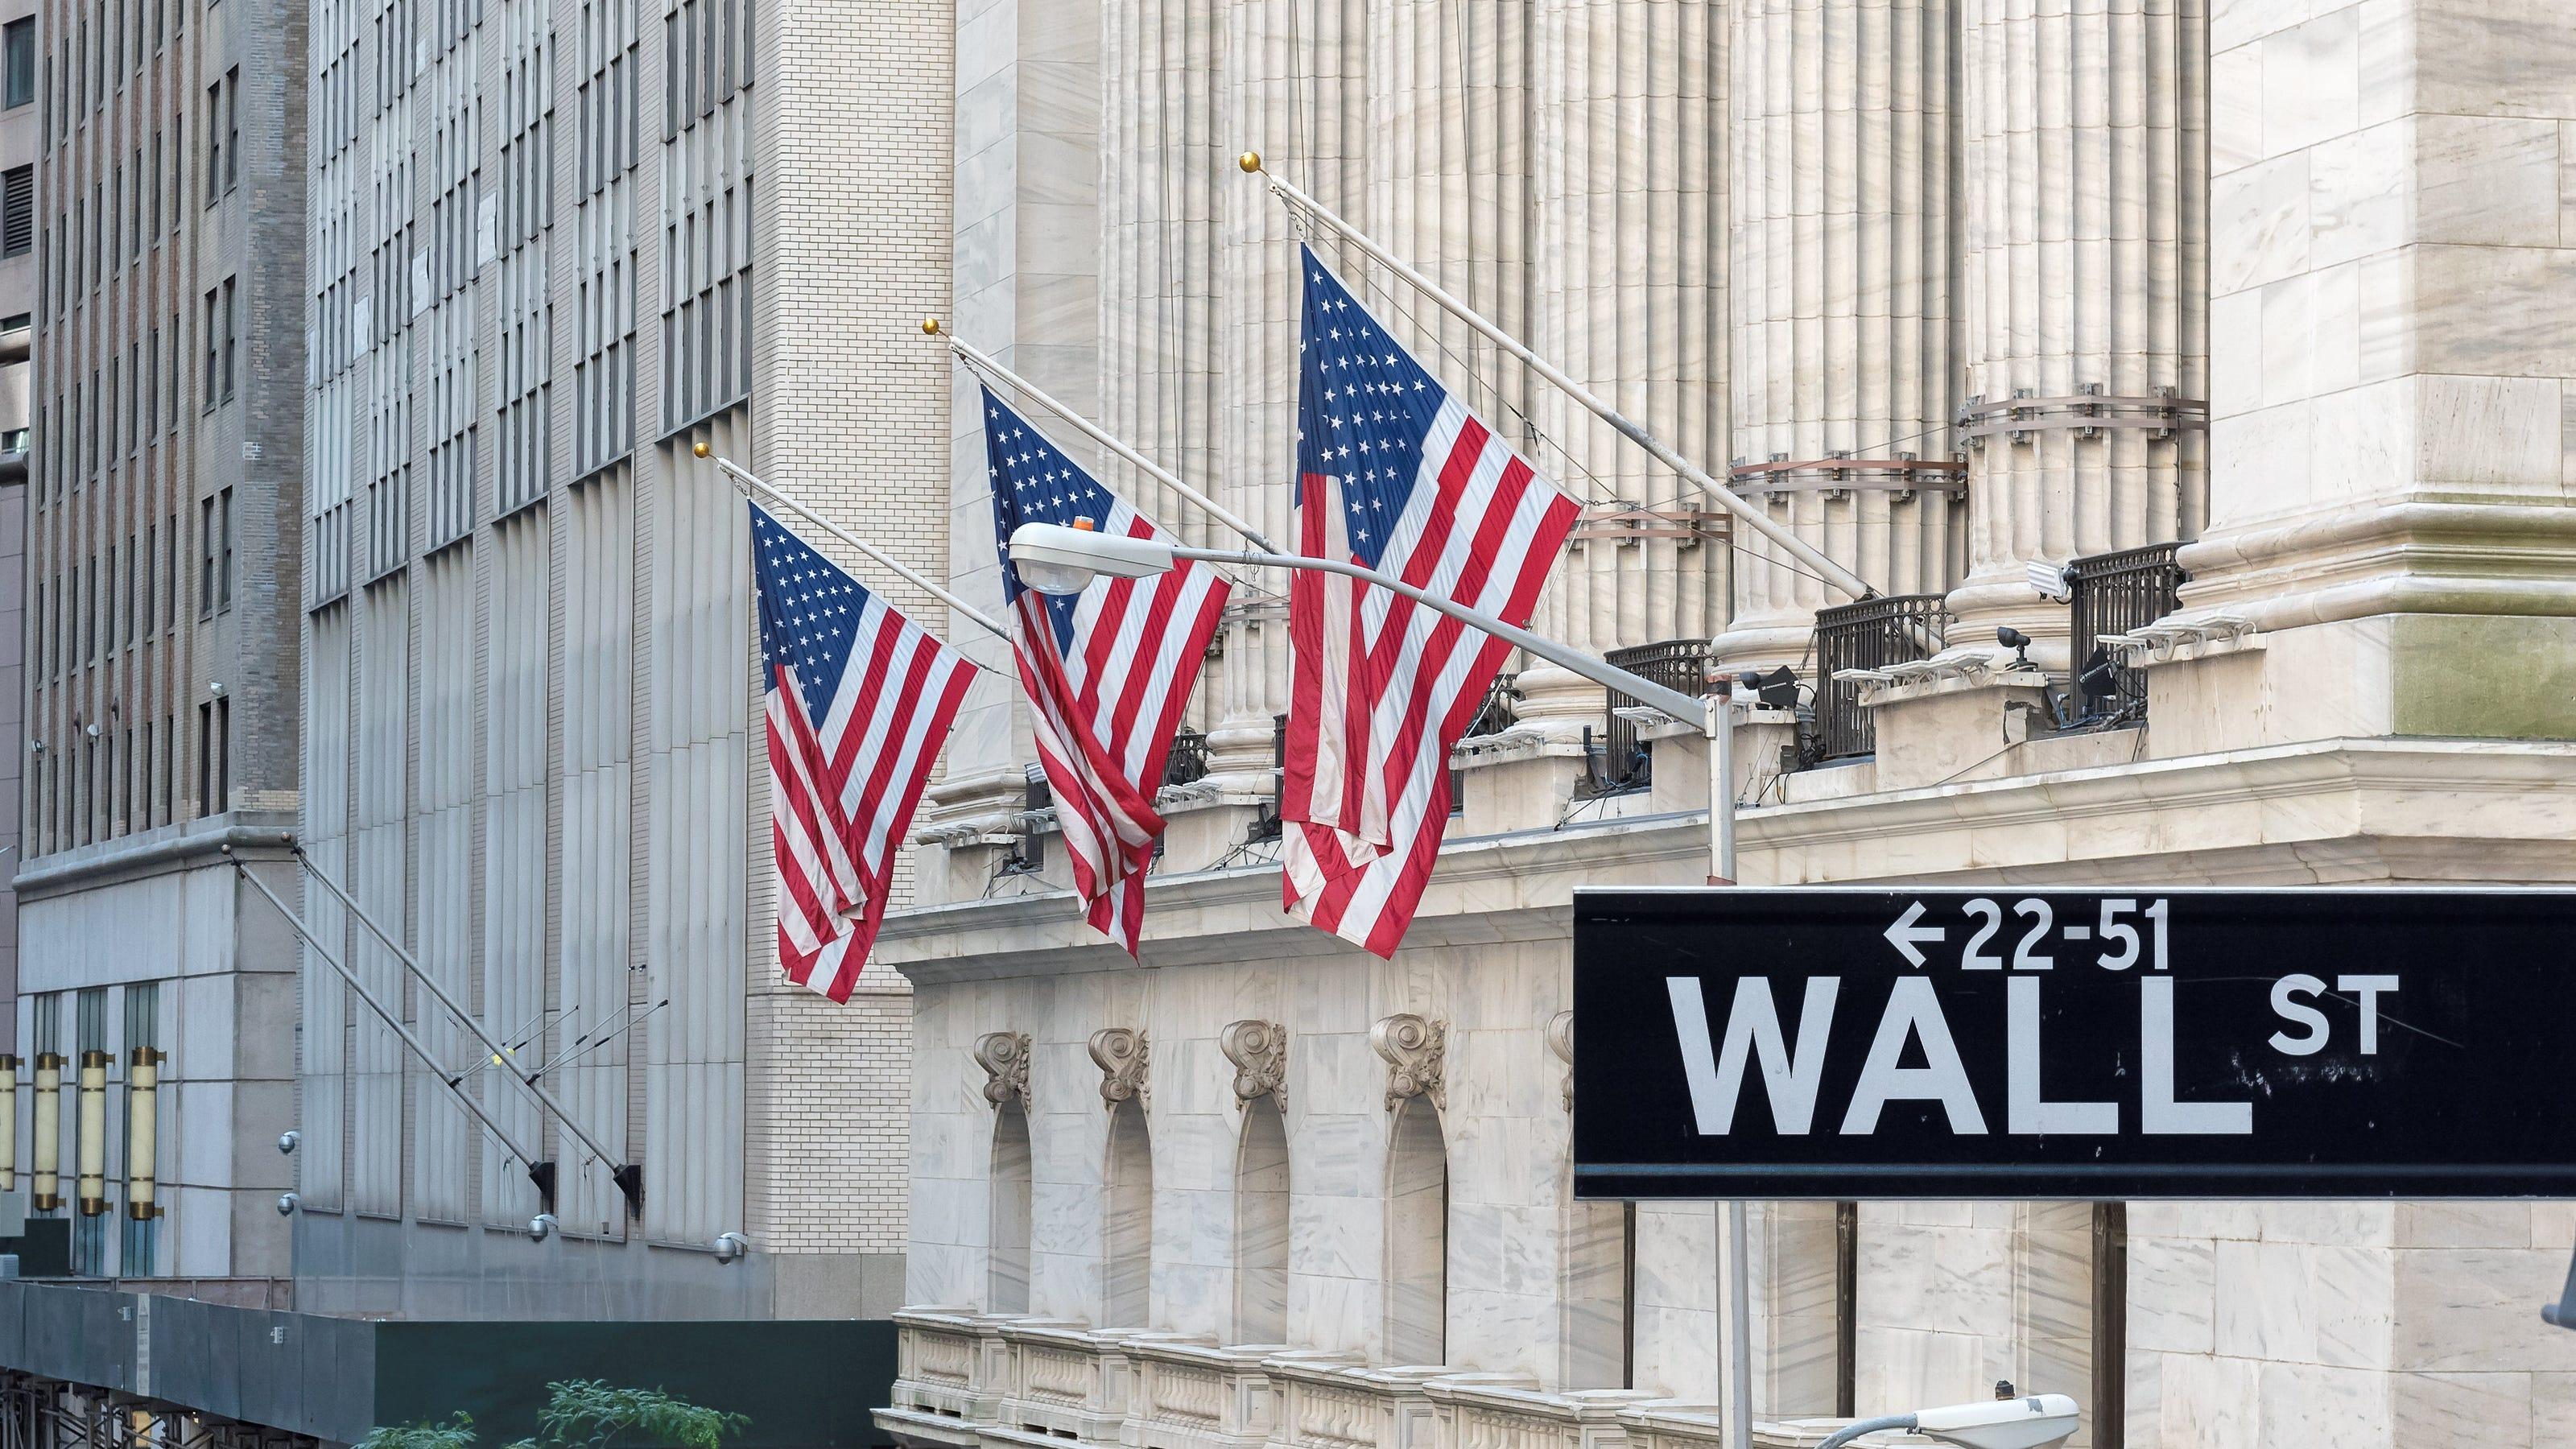 Technology shares sink broader market on Wall Street